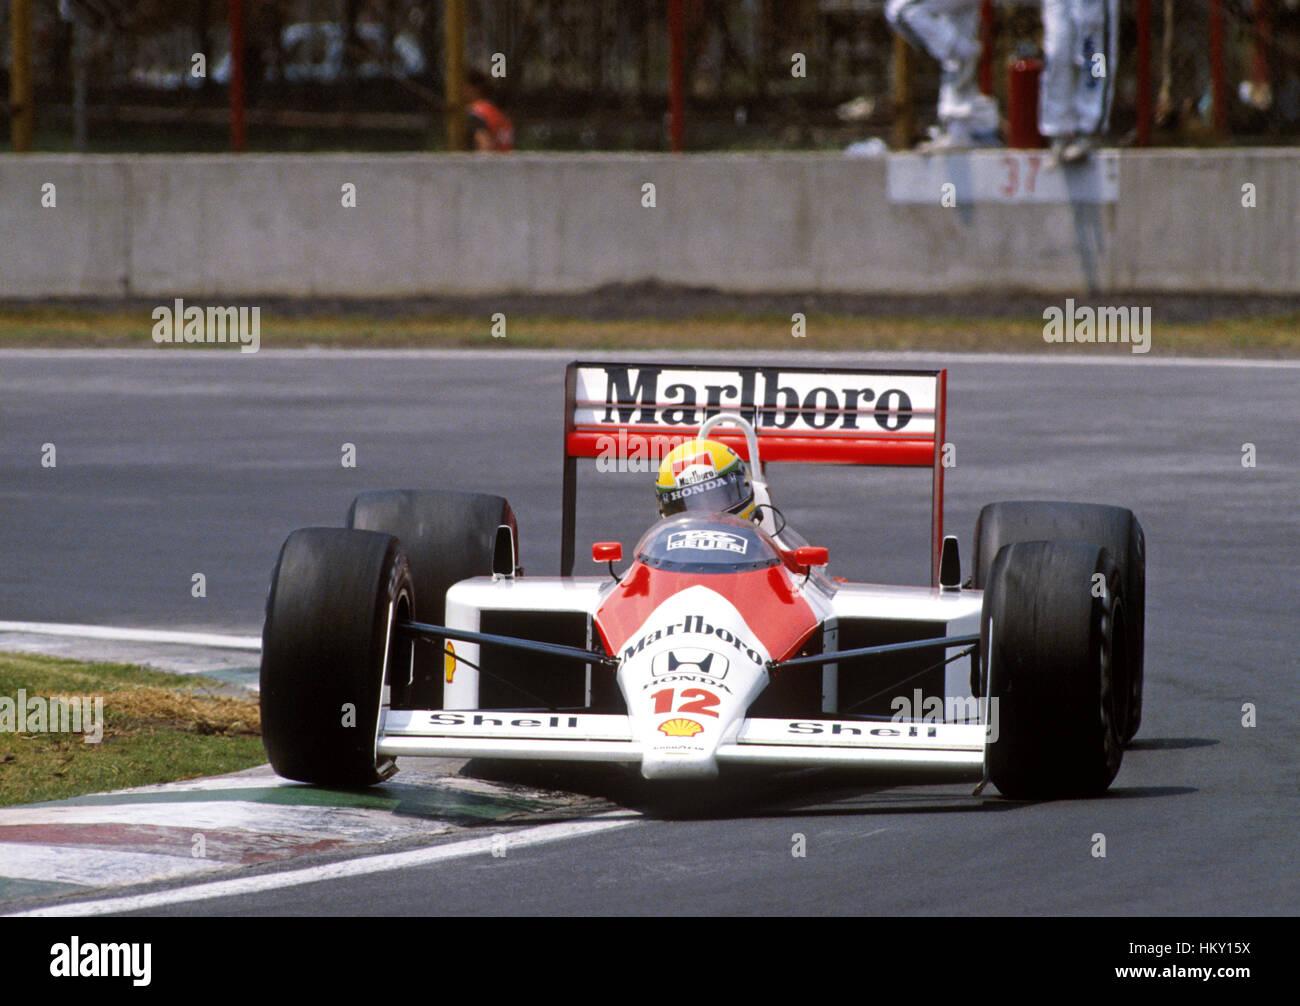 1988 ayrton senna brasilianischen mclaren mp4/4 monza italienische